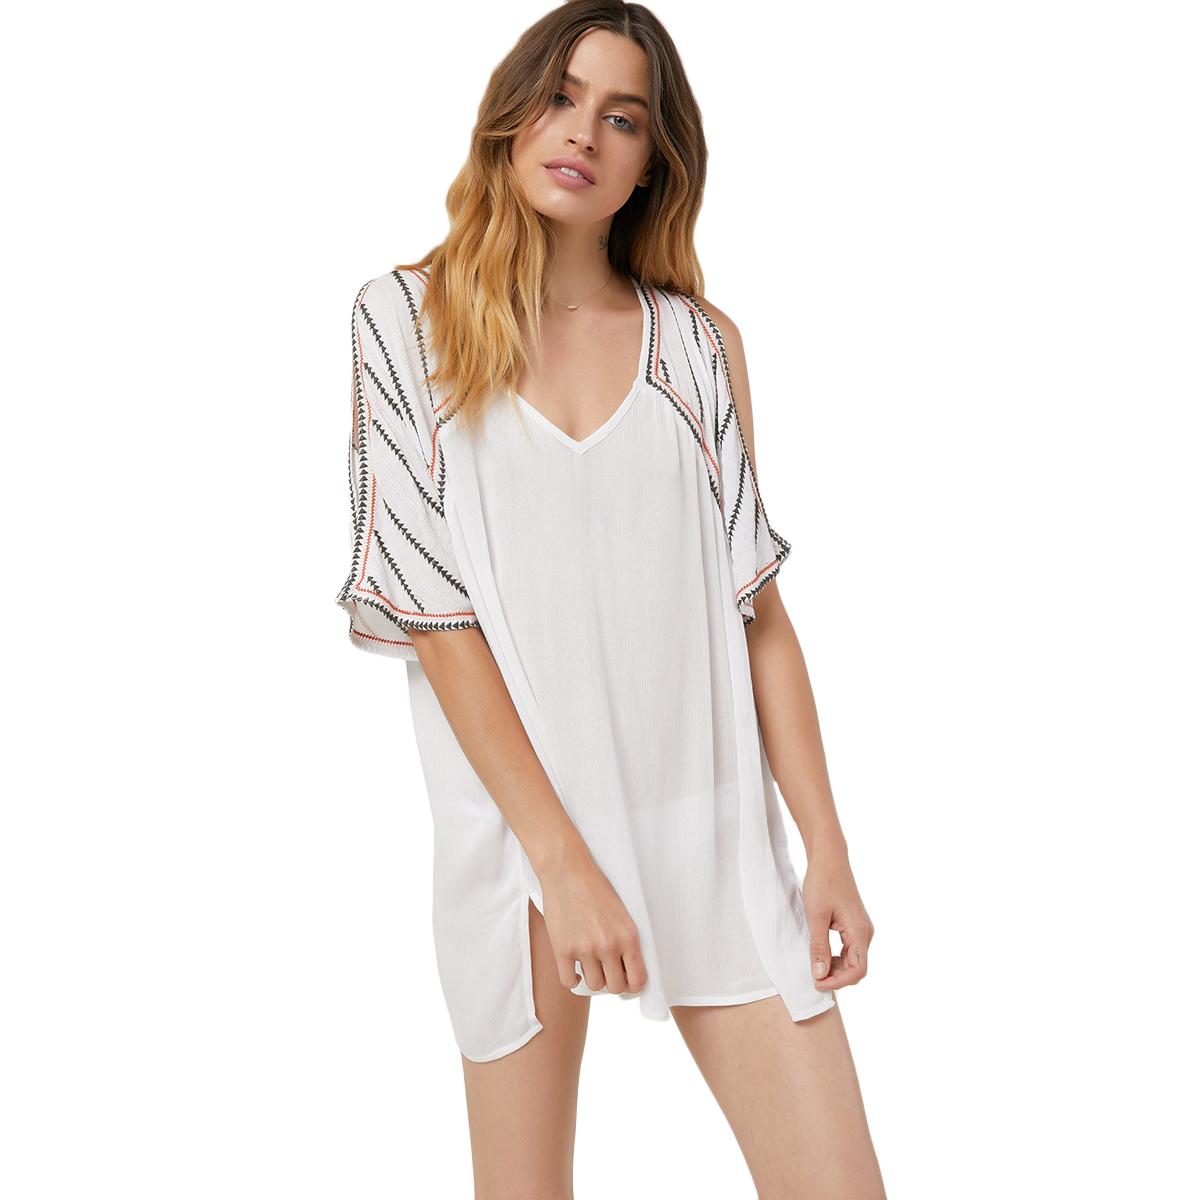 O'neill Juniors' Fran Cover-Up - White, S